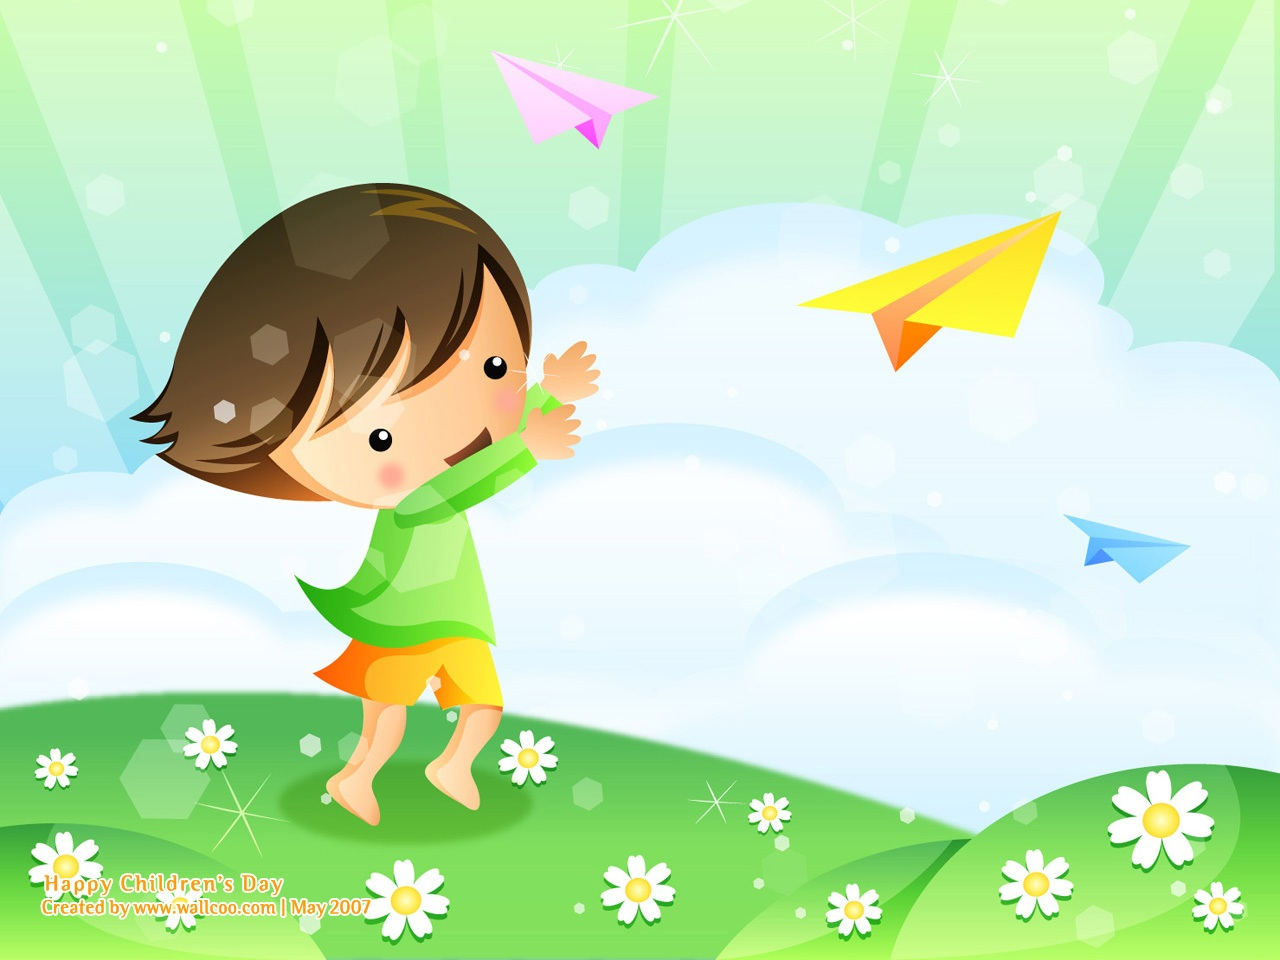 http://2.bp.blogspot.com/--VaMg0CK9OY/TahbGzsbH0I/AAAAAAAAADw/ikRuVJoUA3U/s1600/Kids-paper-airplane-718.jpg